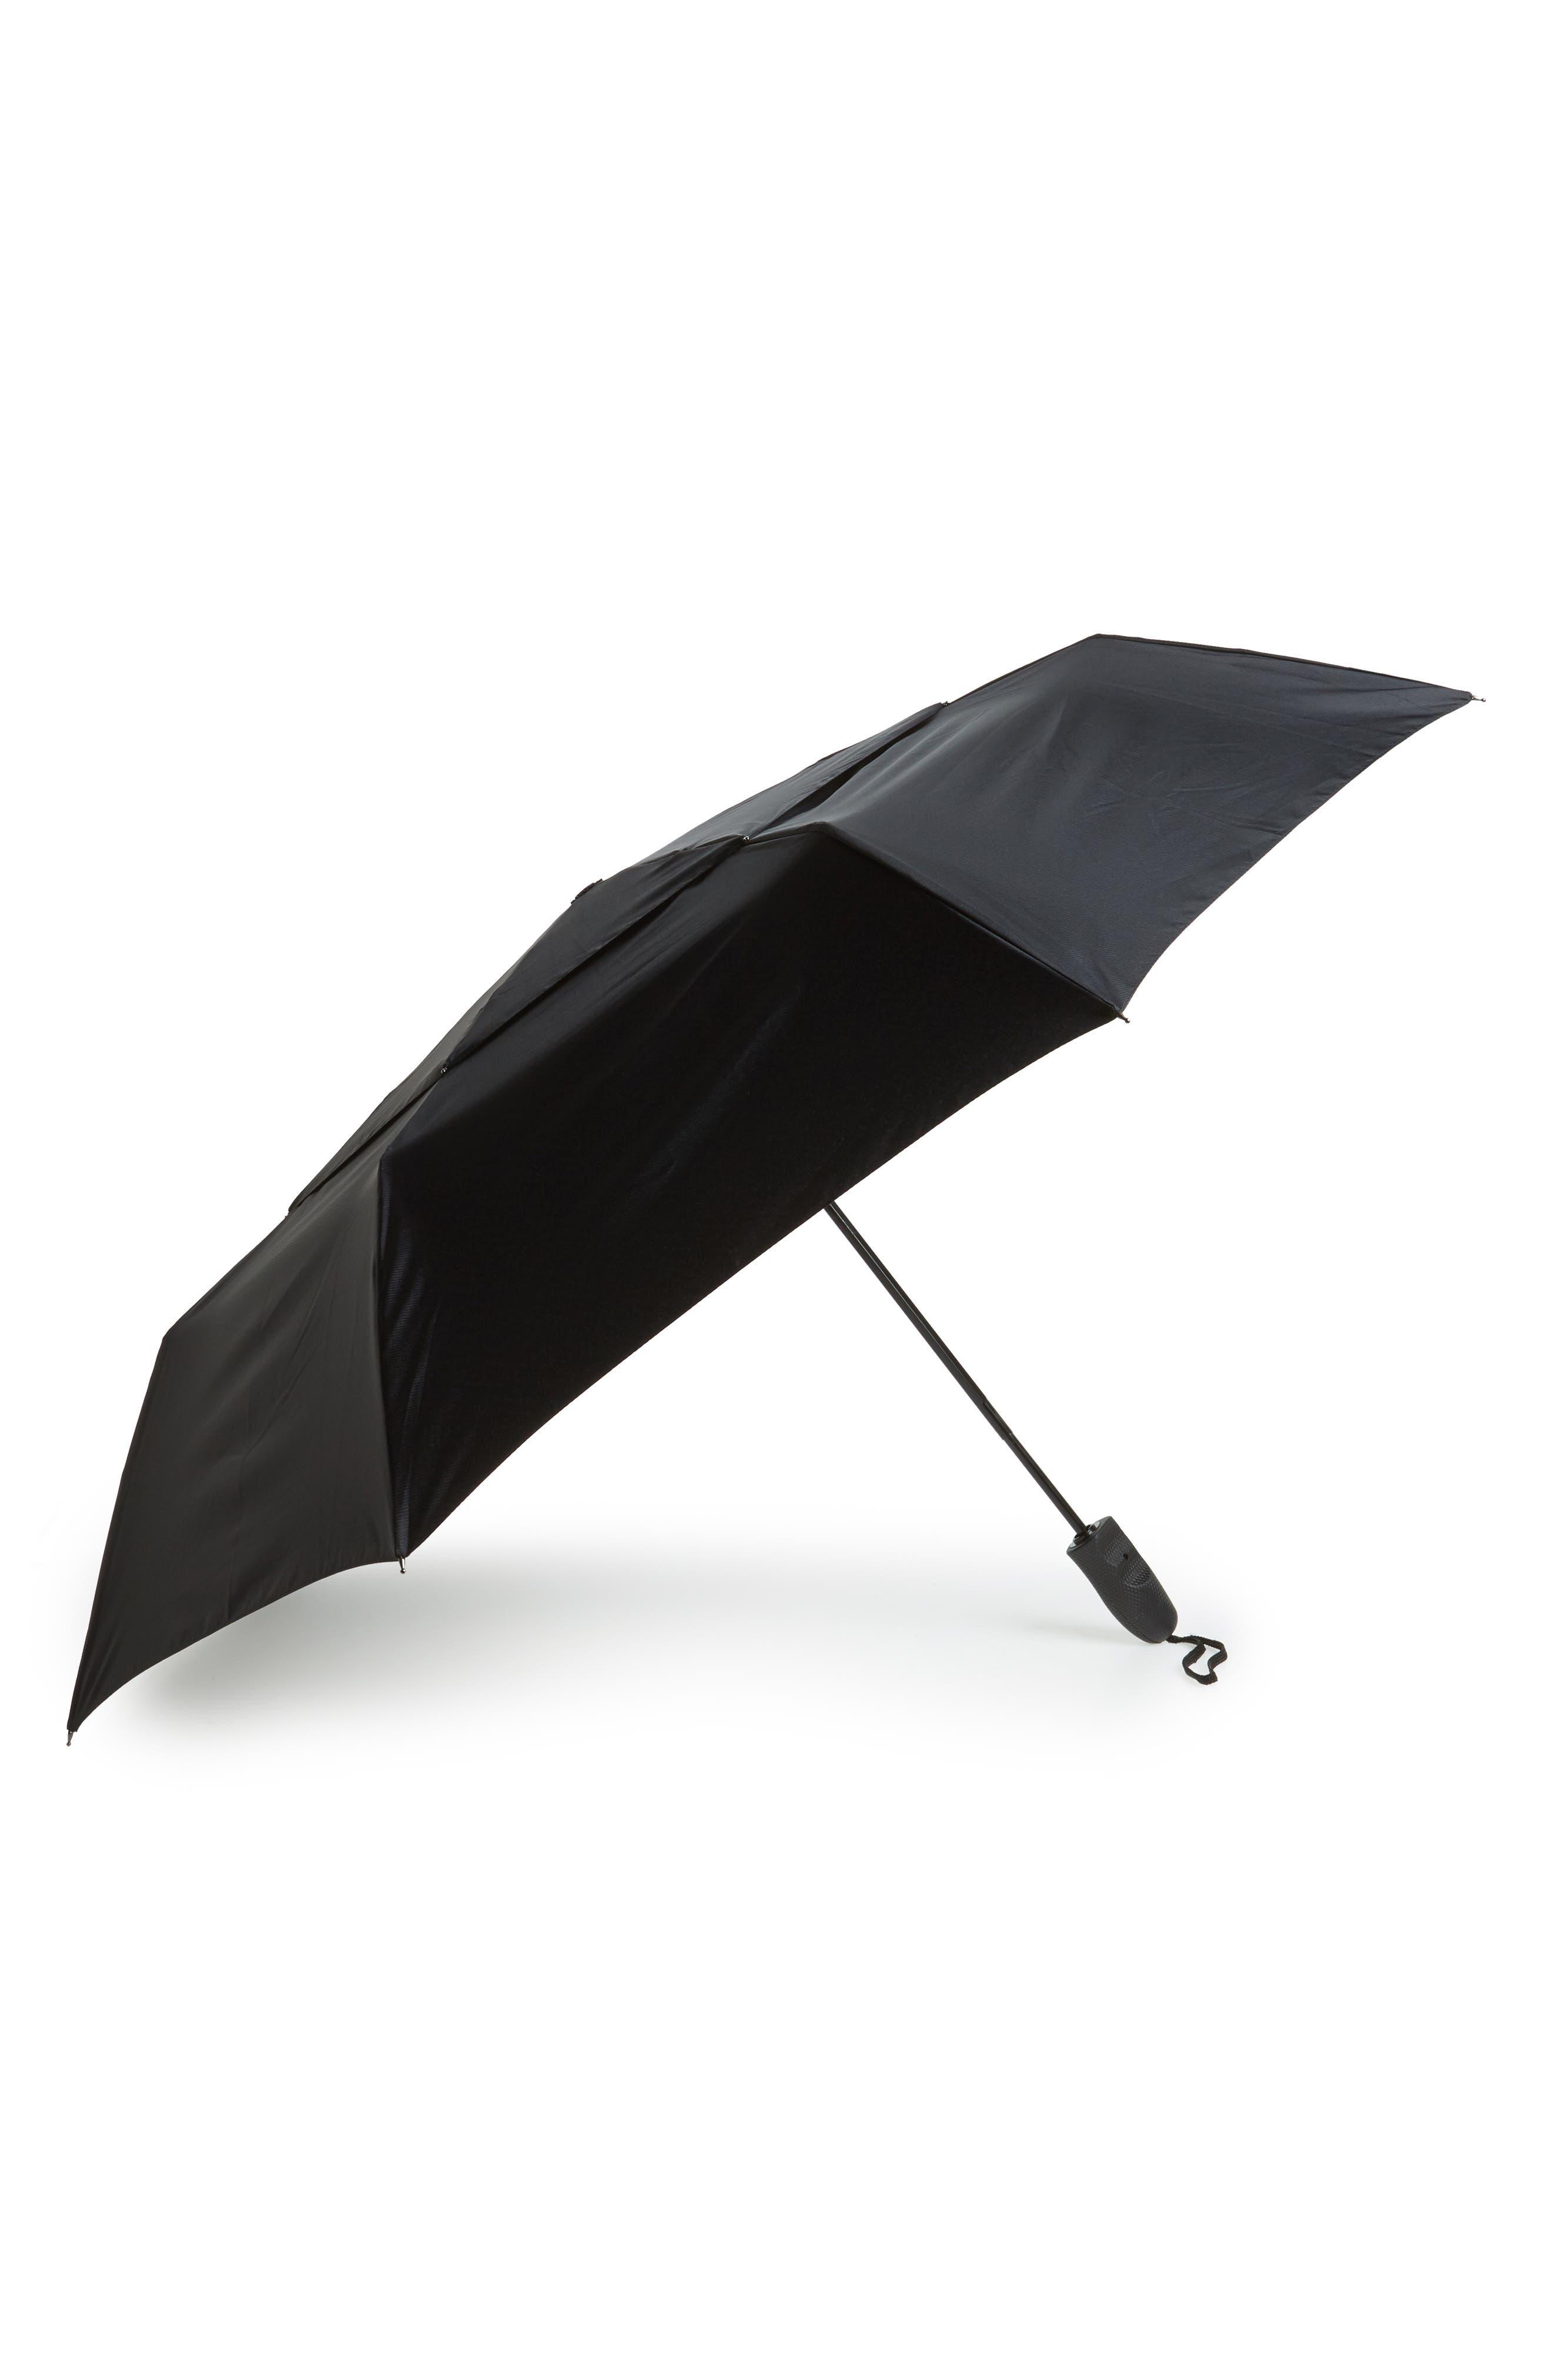 Telescoping Umbrella,                             Main thumbnail 1, color,                             BLACK